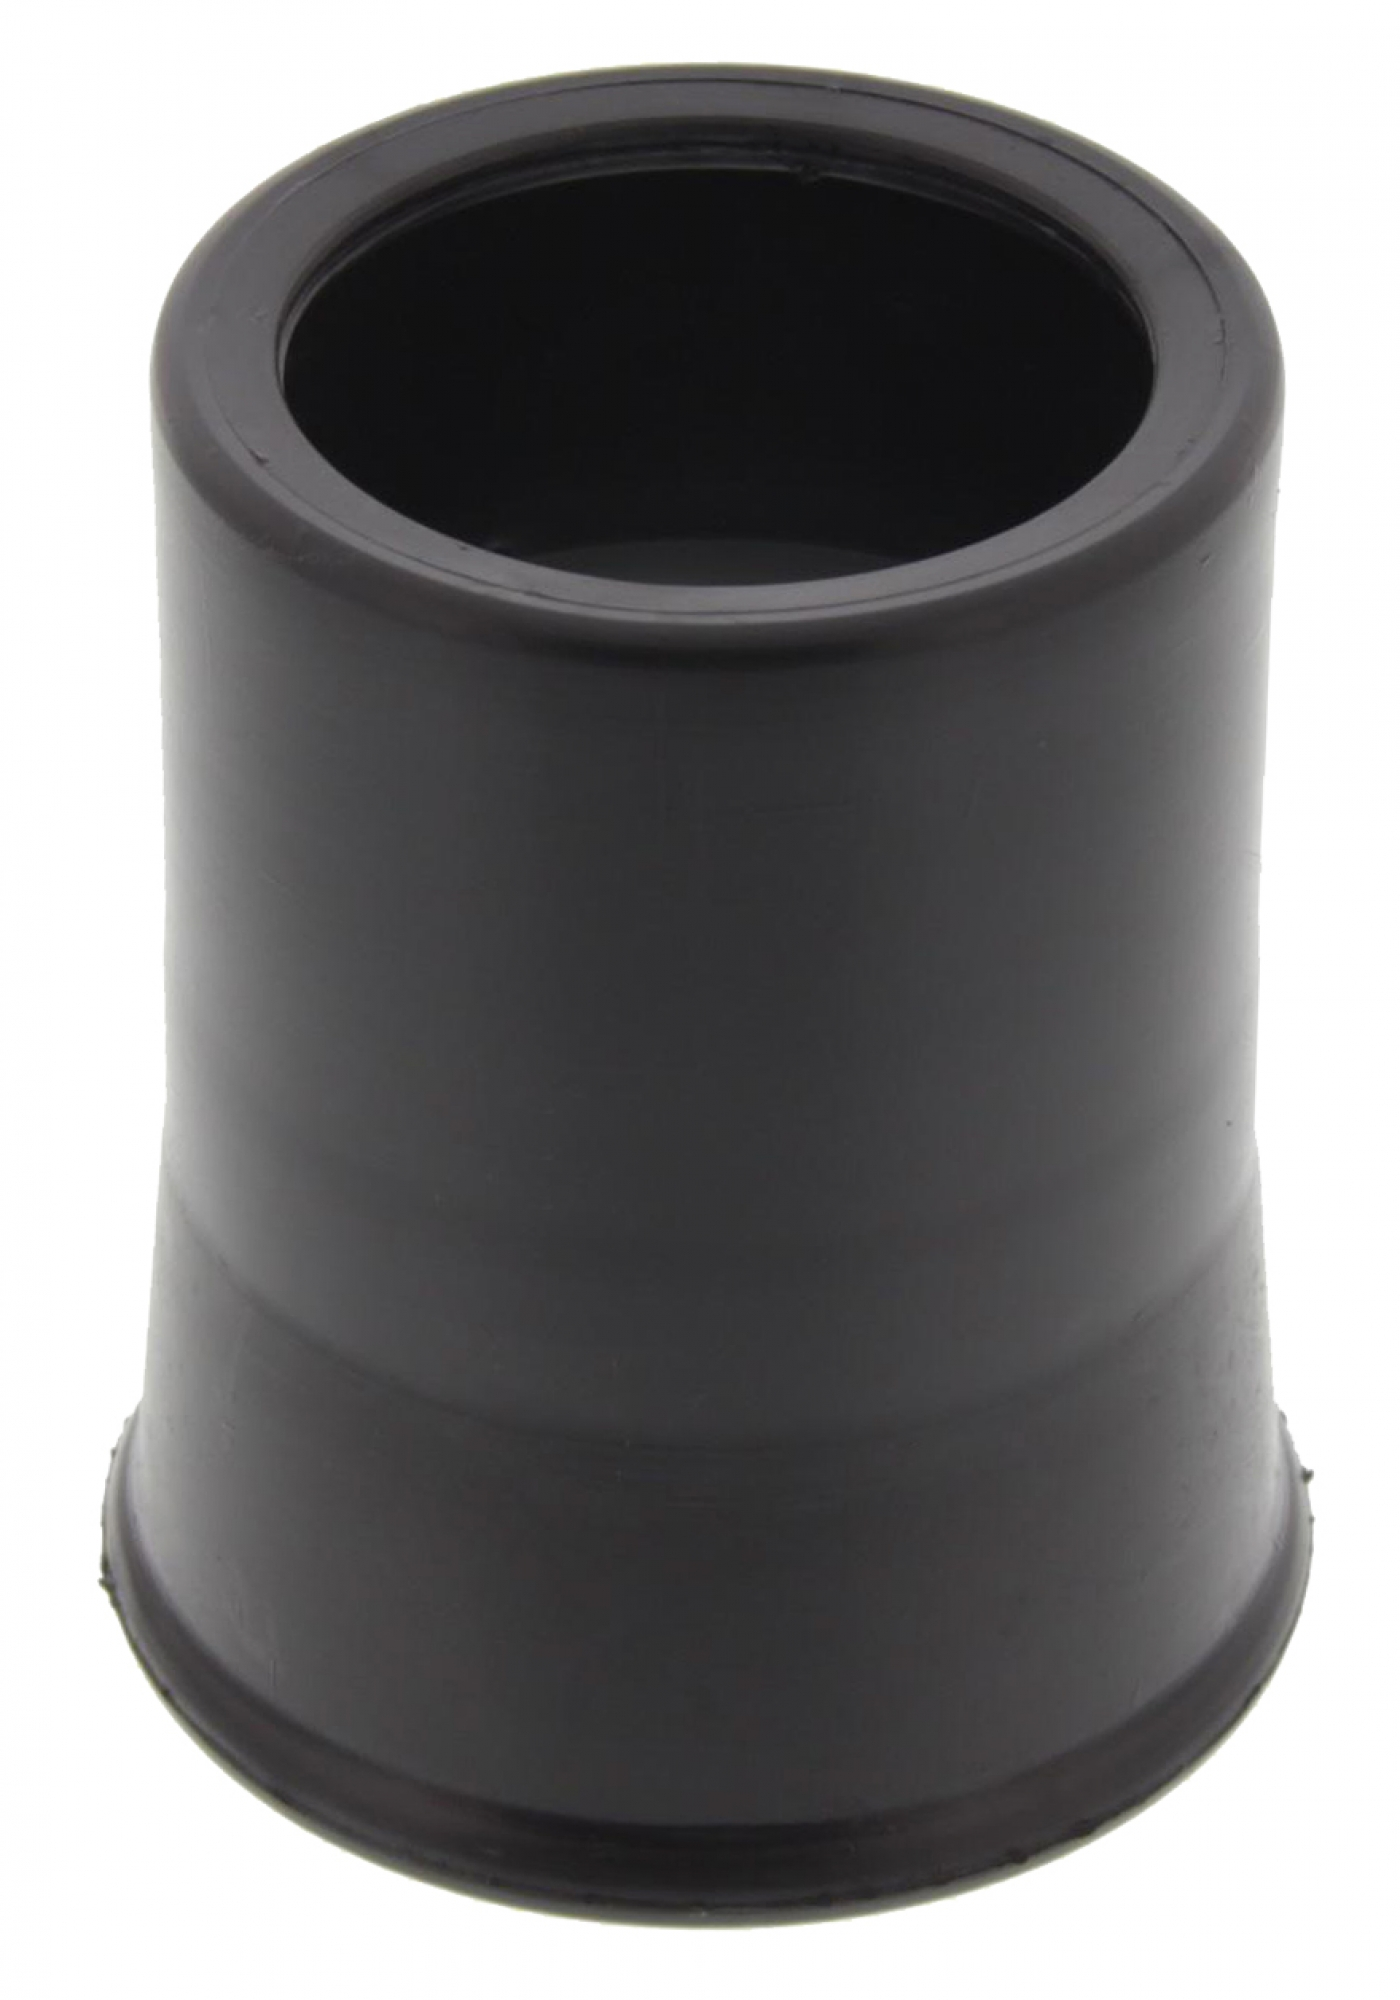 MAPCO 32812 Schutzkappe Stoßdämpfer